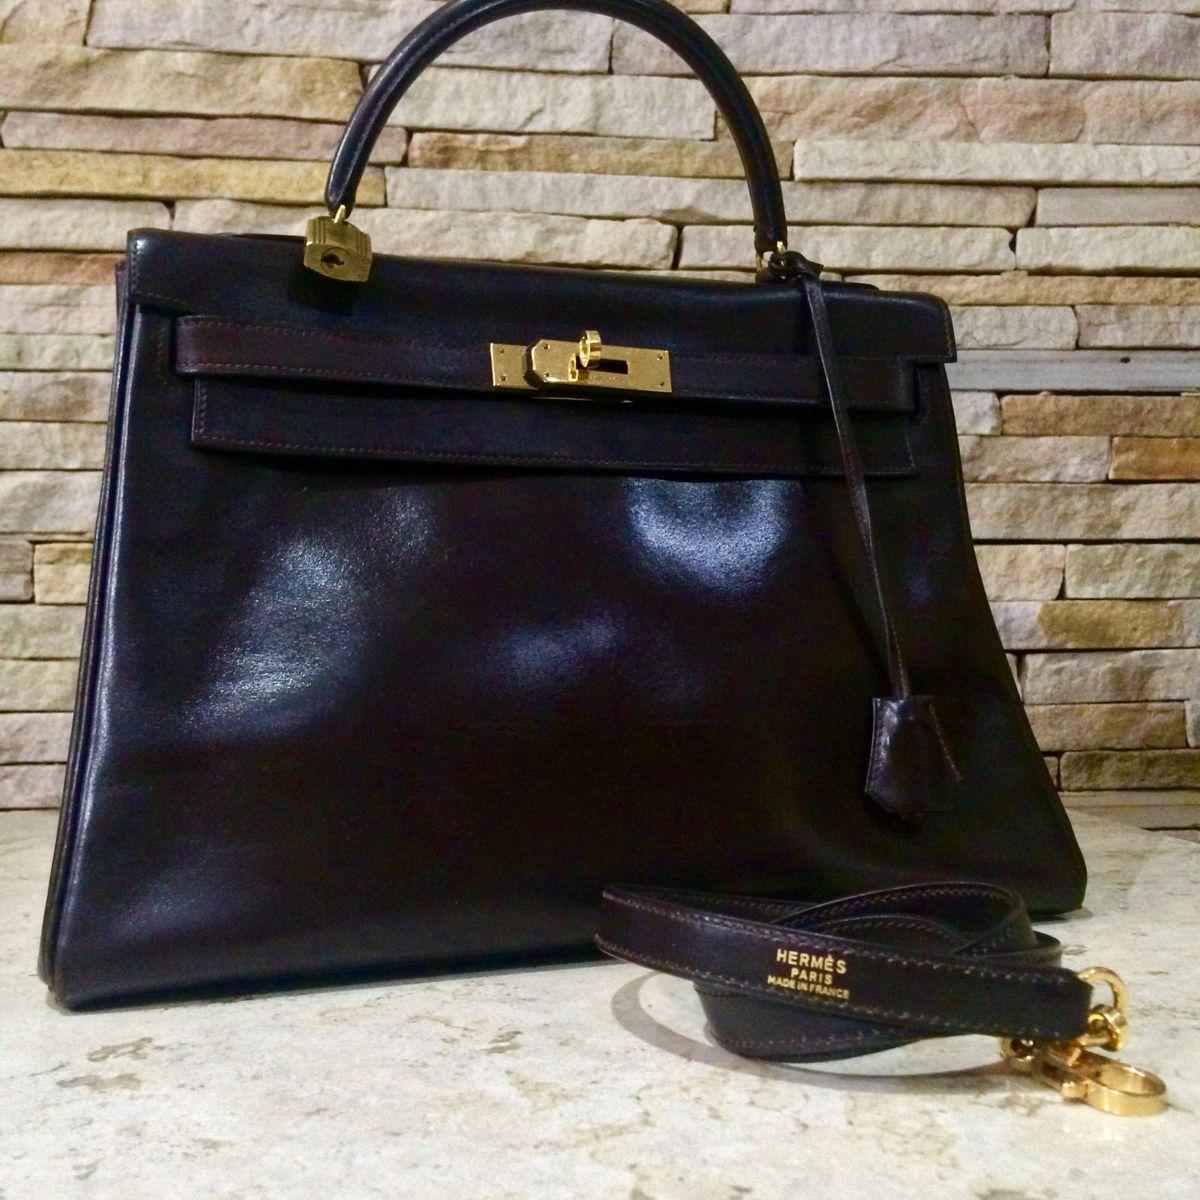 38b2633577a Bolsa Kelly Hermes Original Tamanho 32 Chocolate